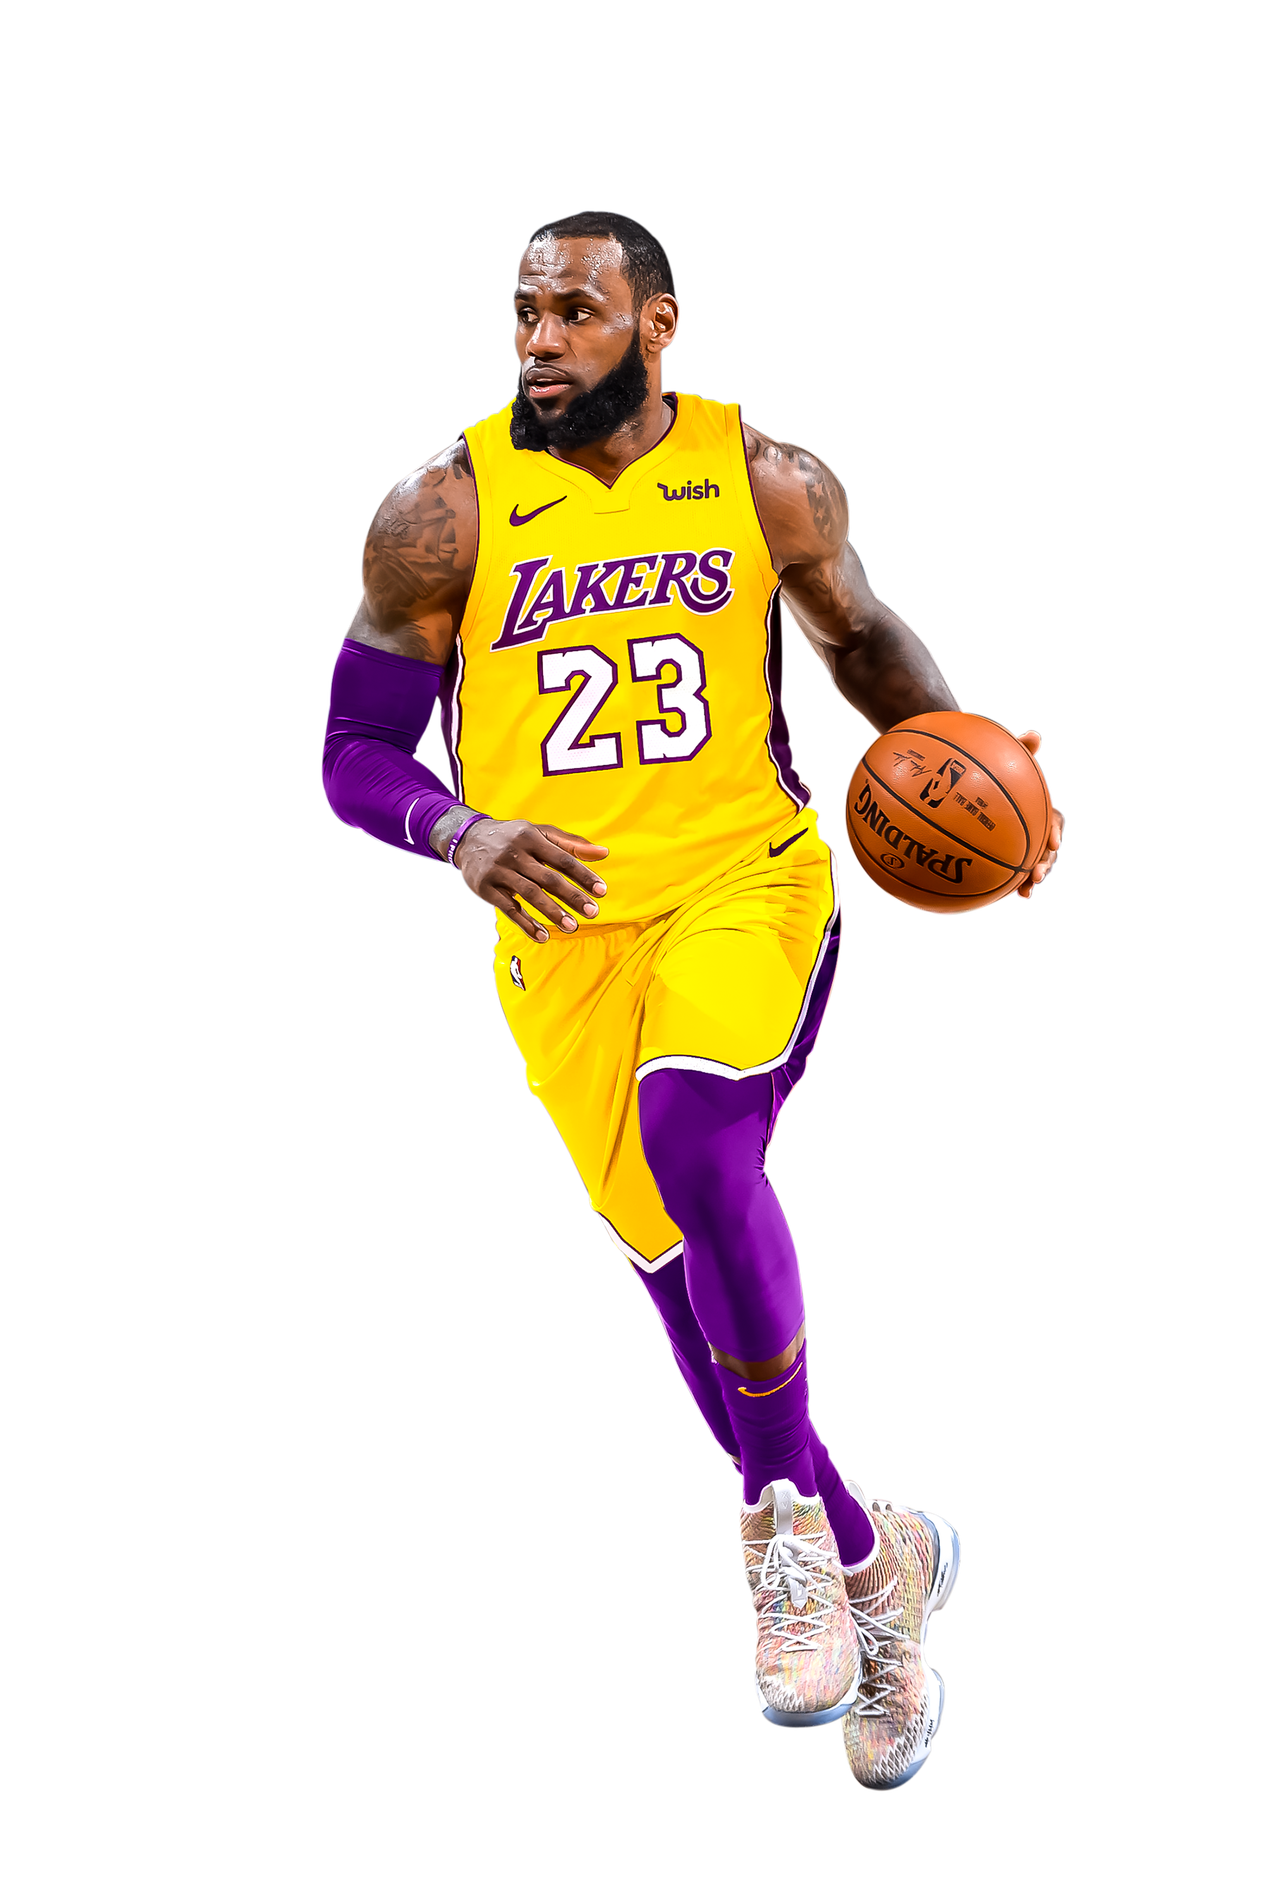 Pin By Face On Salvataggi Rapidi In 2021 Lebron James Lakers Lebron James Lebron